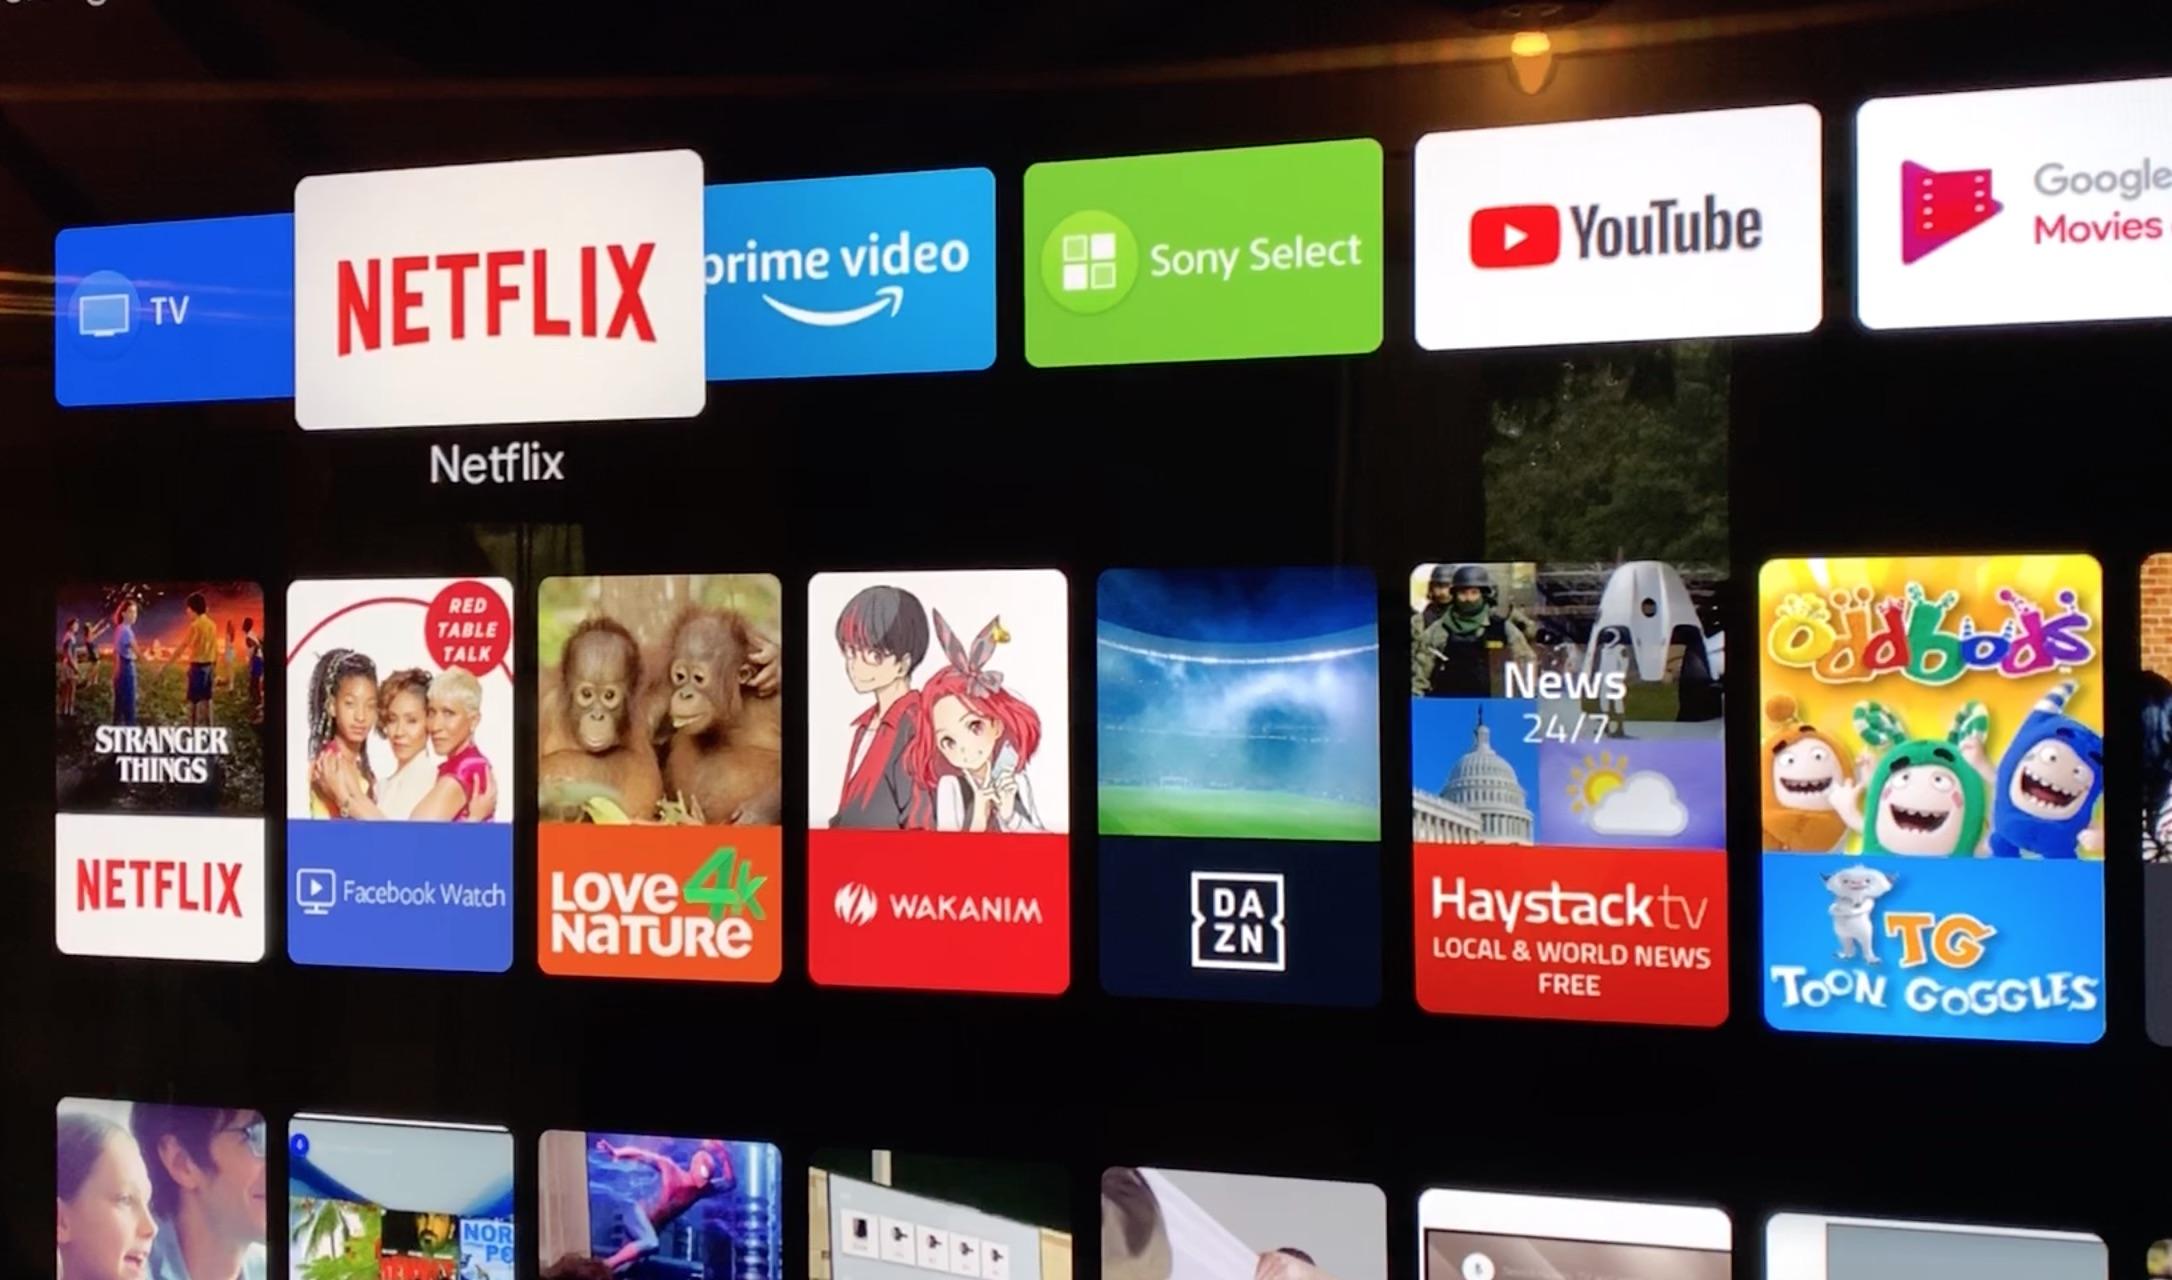 Netflix TV Calibration